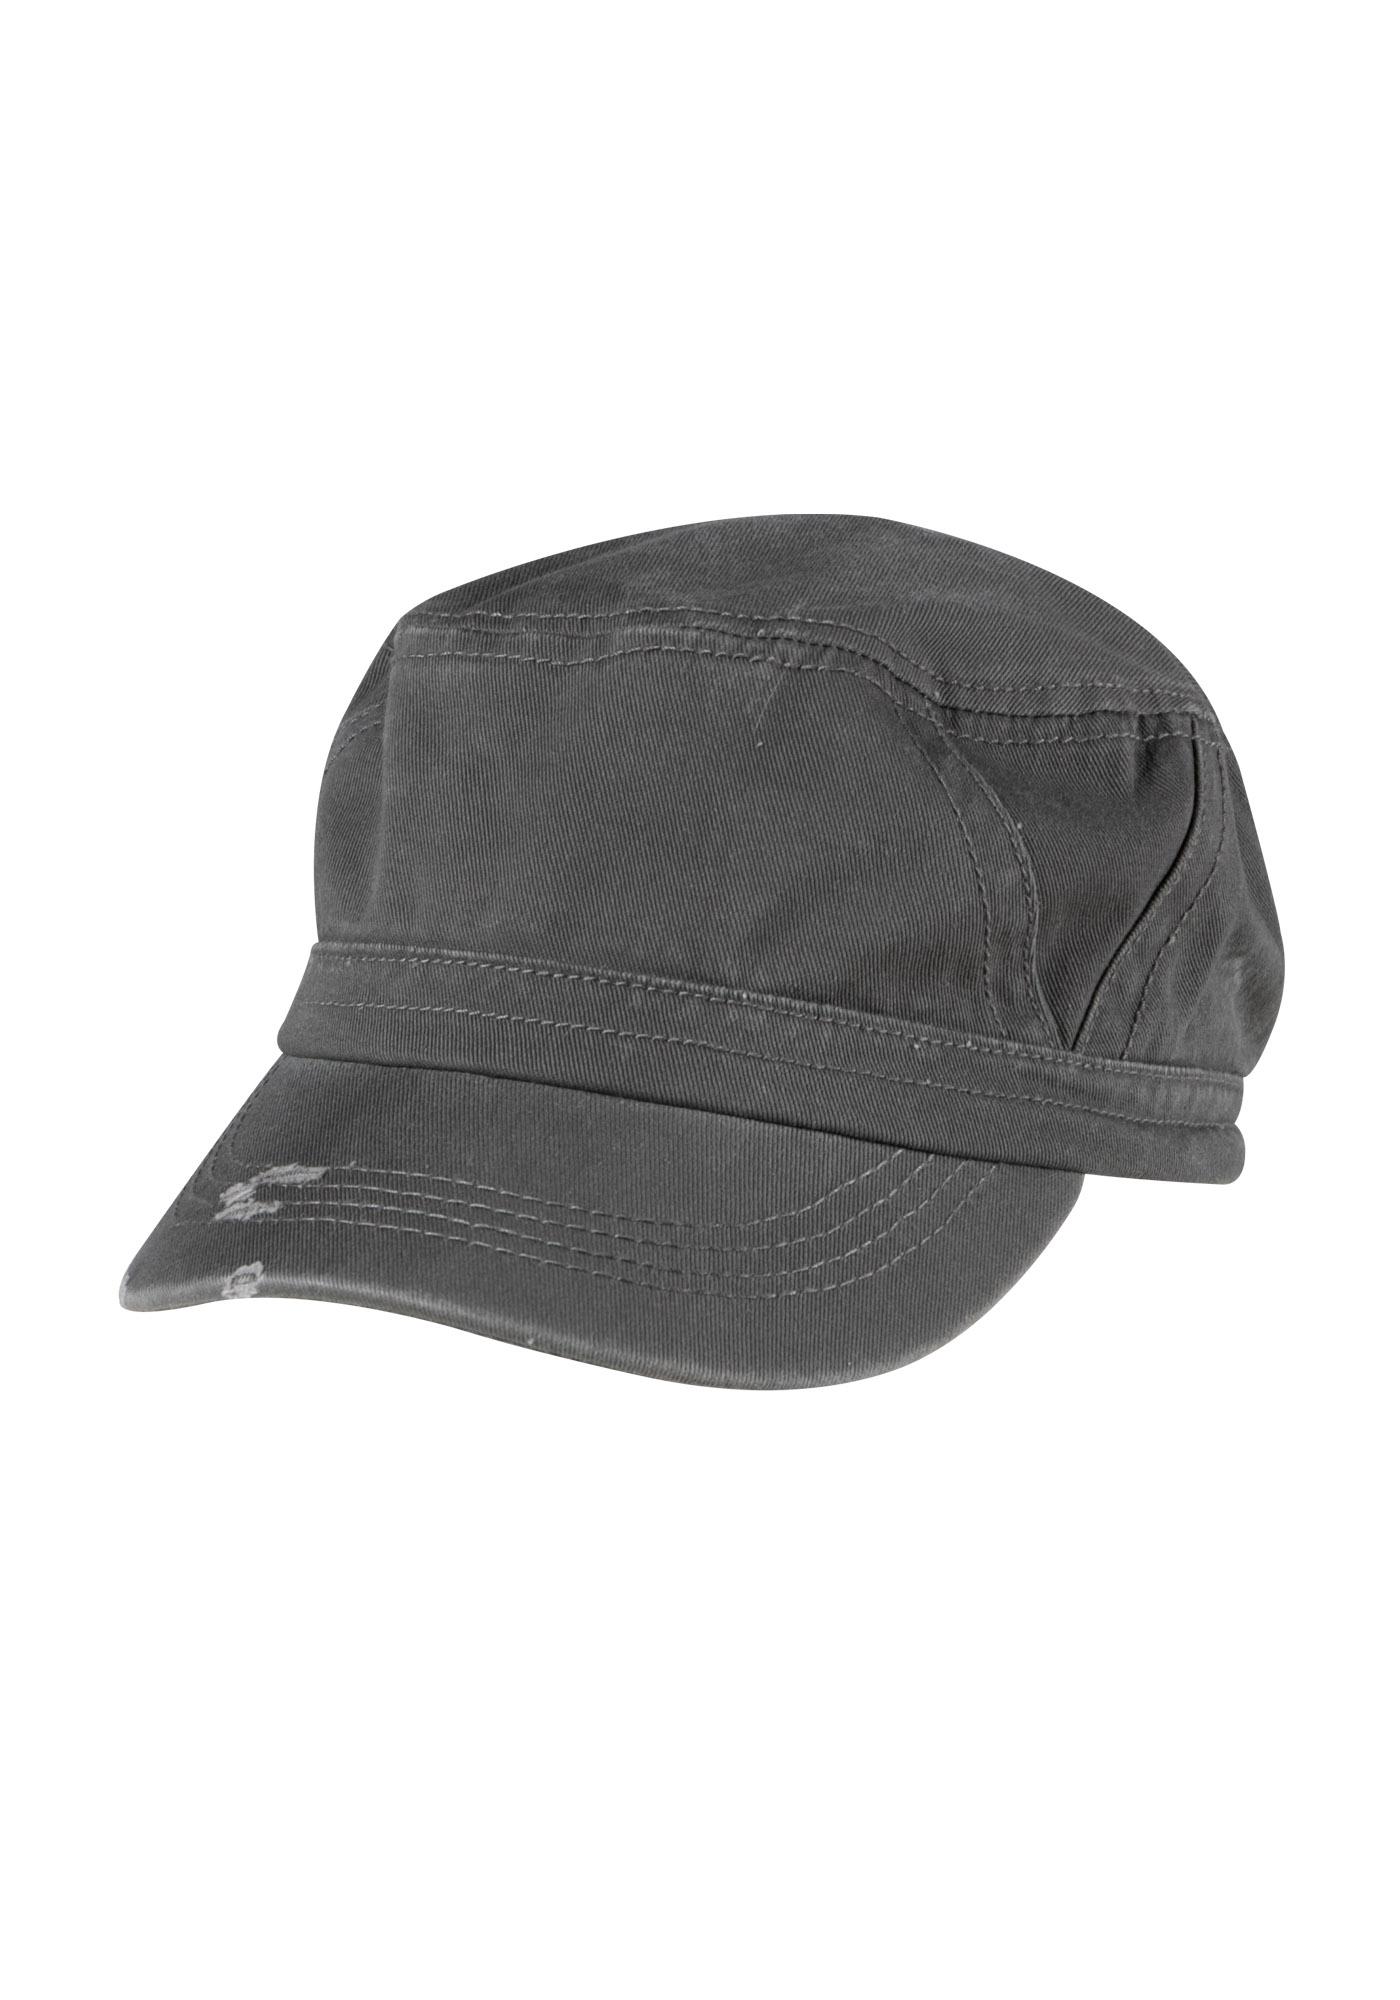 Men's Cadet Hat | Warehouse One